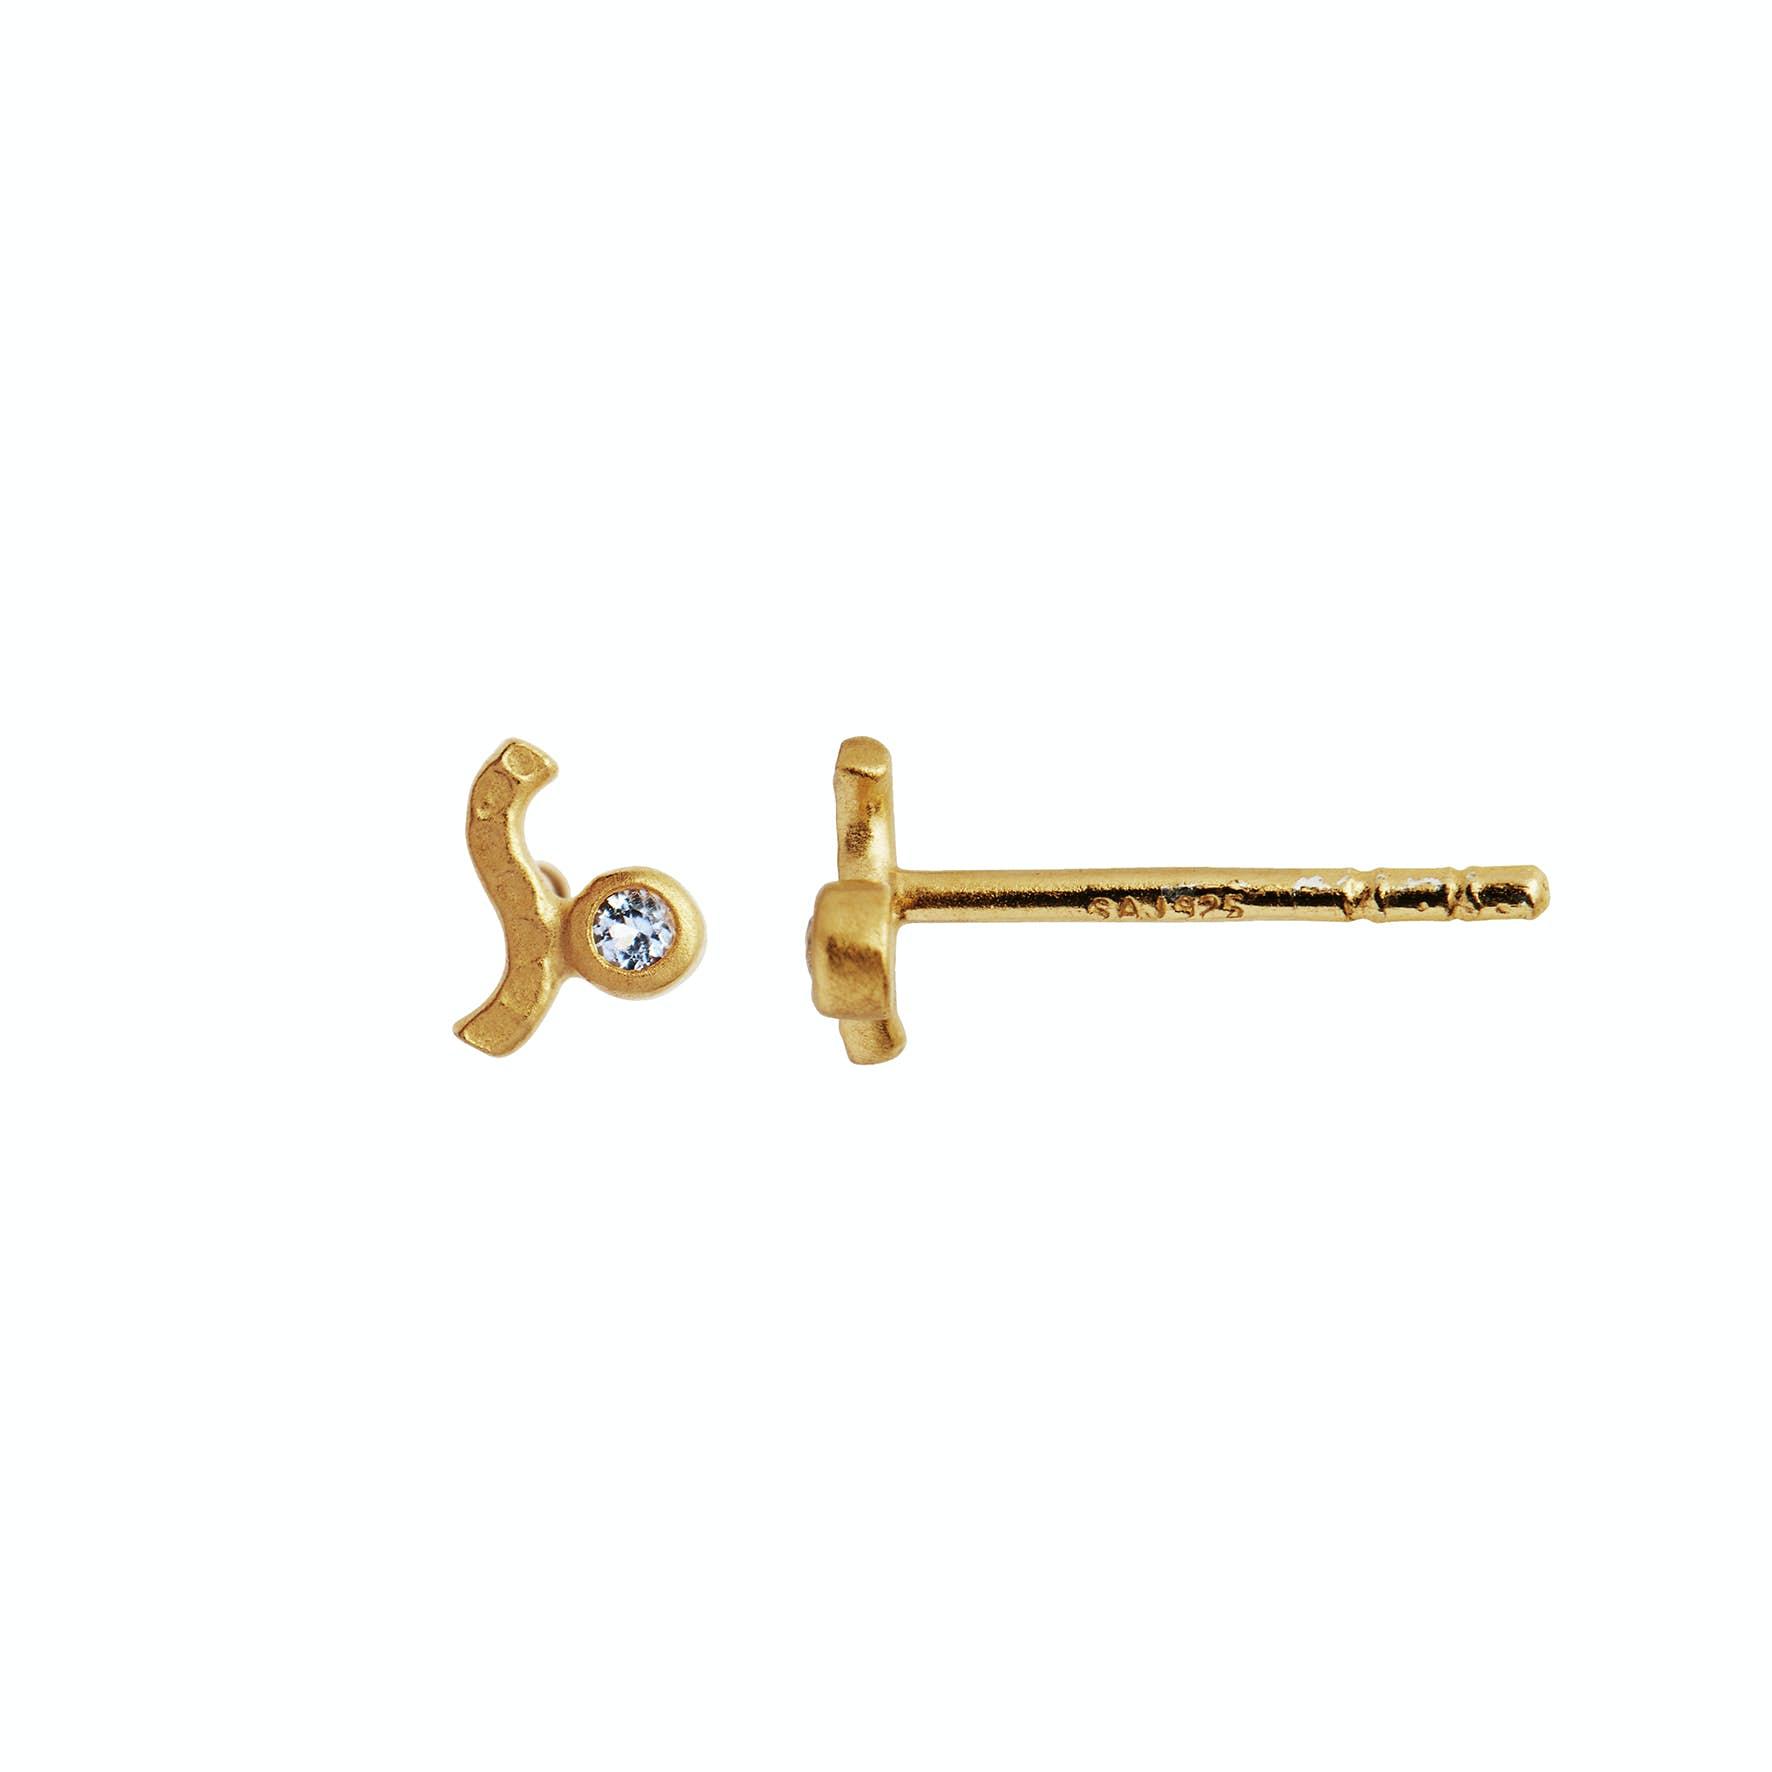 Petit Wave Earstick With Stone - Light Blue fra STINE A Jewelry i Forgyldt-Sølv Sterling 925